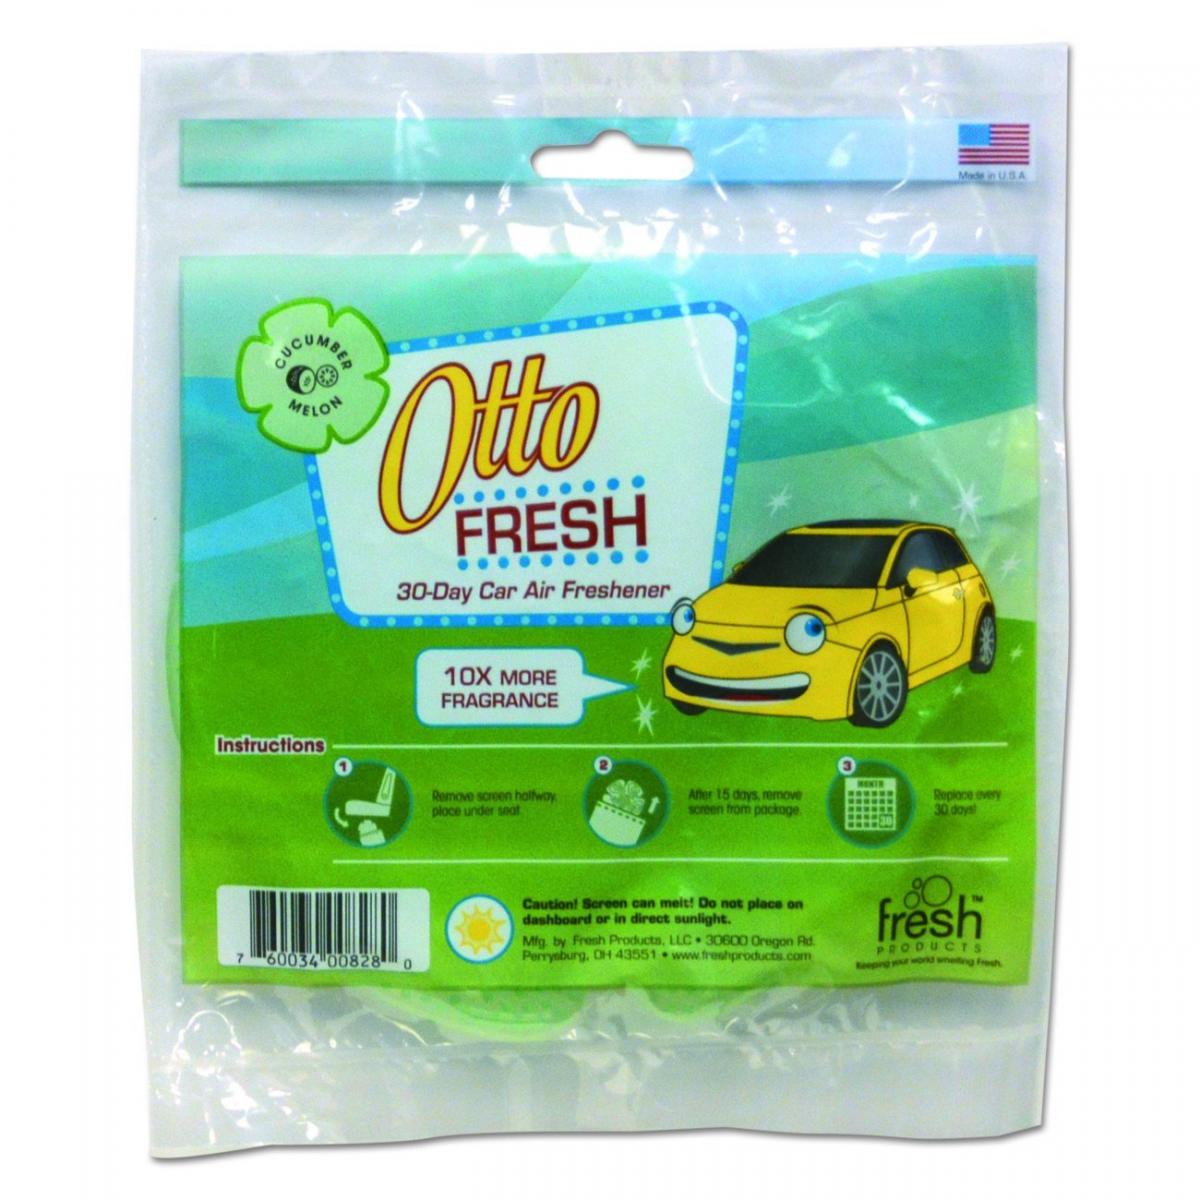 FrePro Otto Fresh vůně do auta